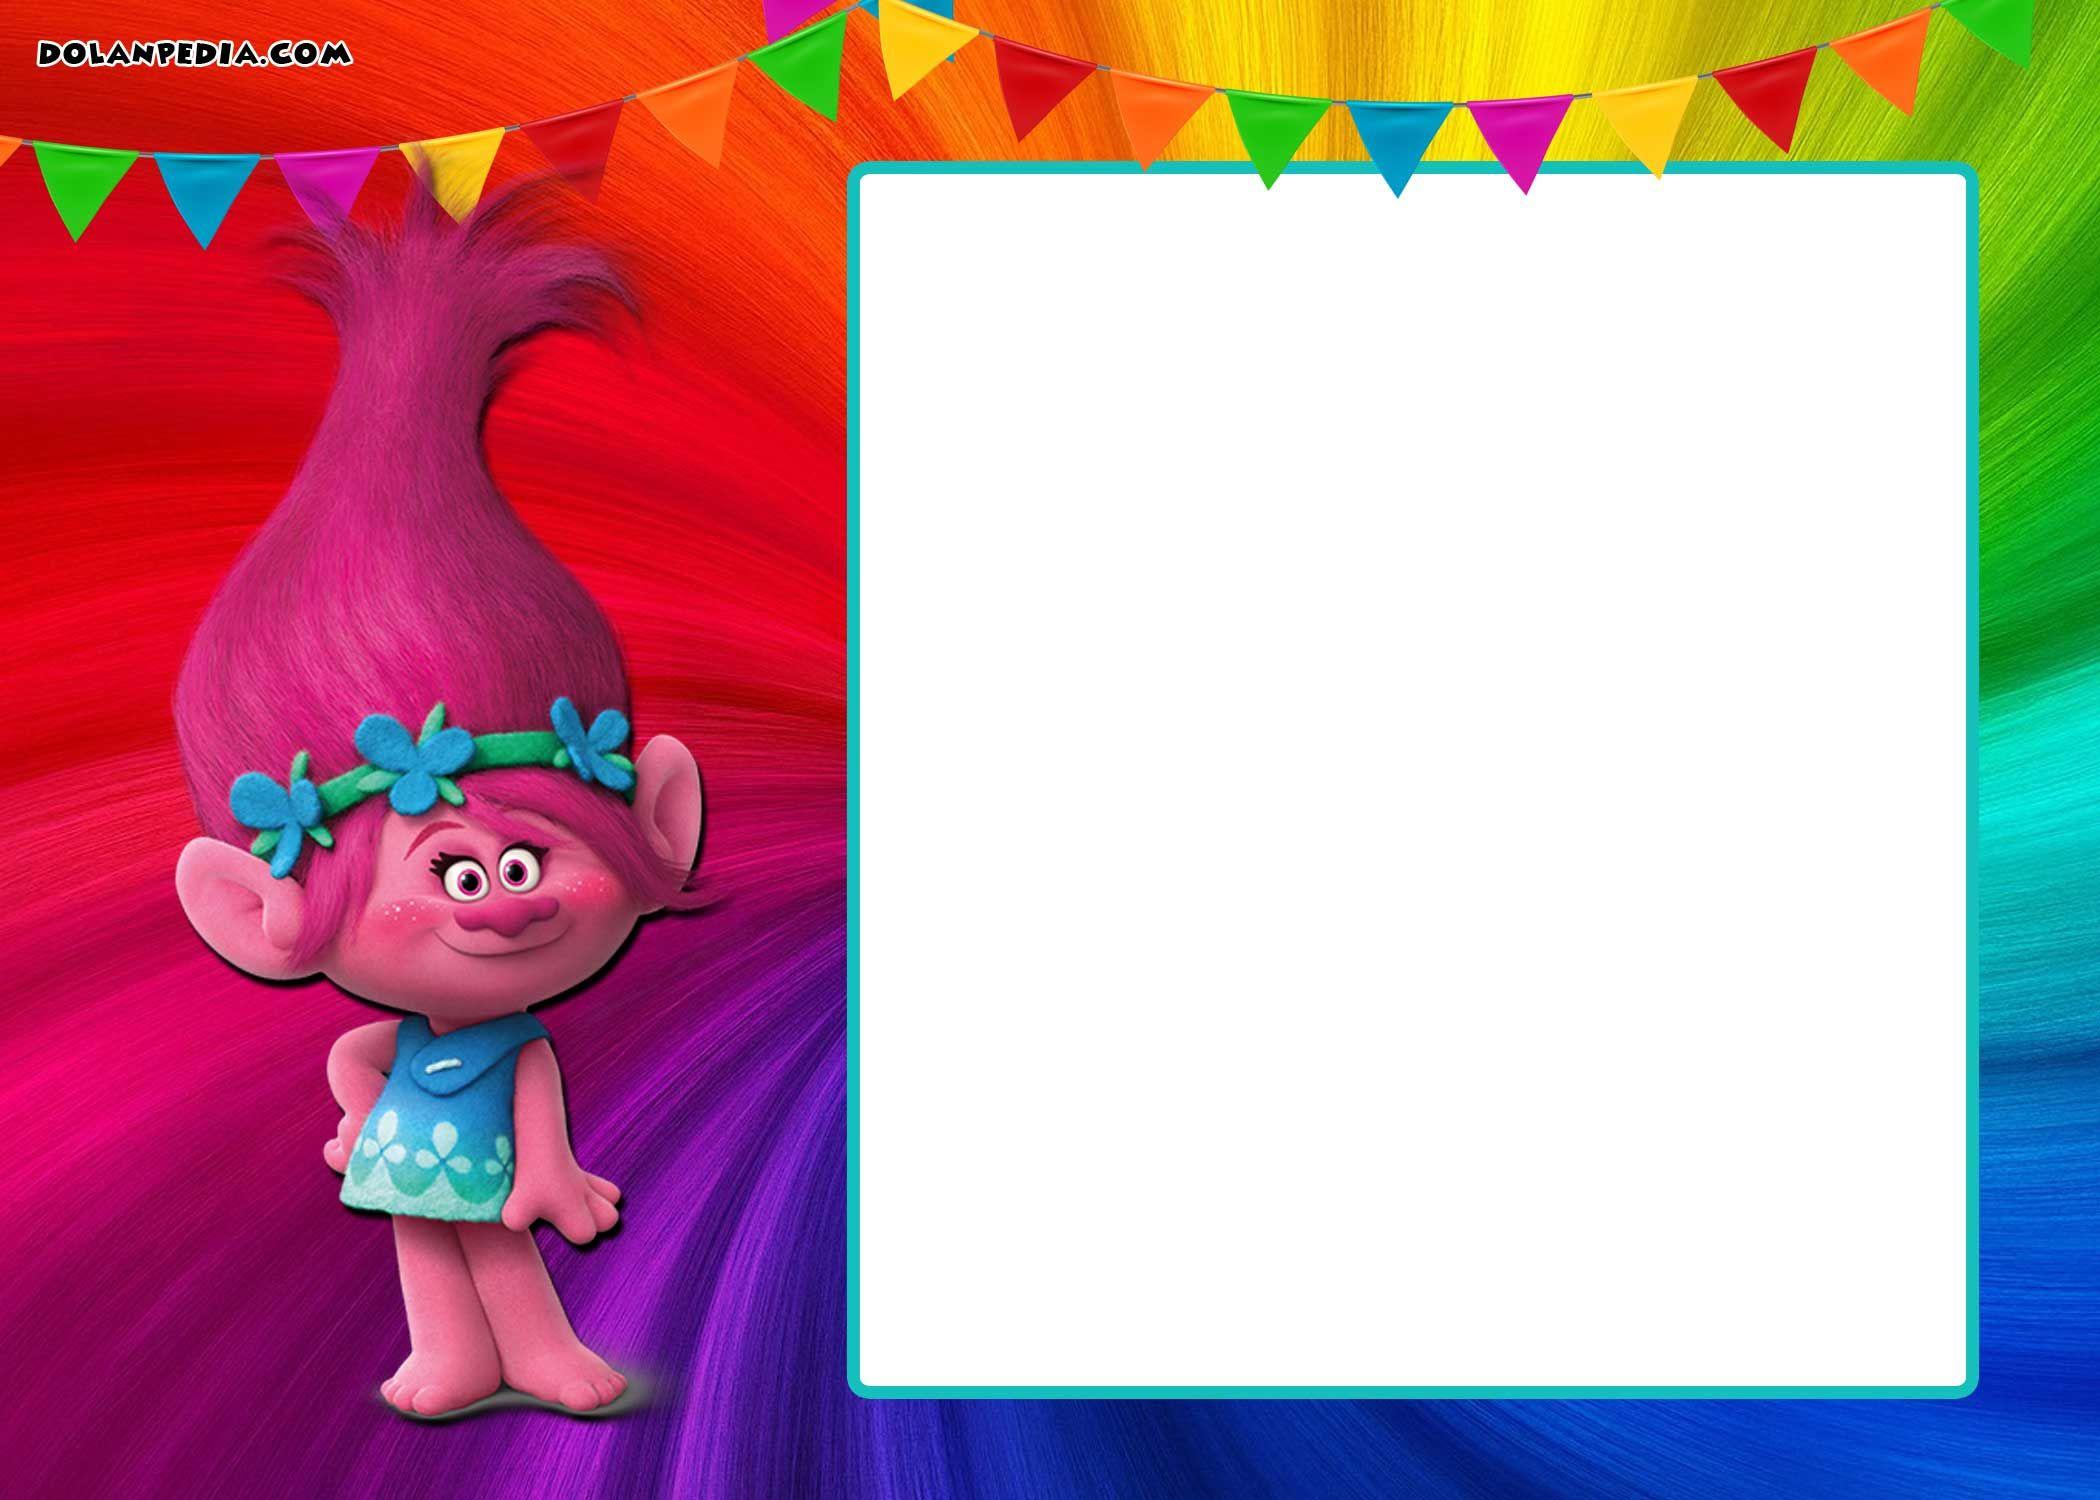 Invitation. Free Printable Shrek Birthday Invitations - Free Printable Shrek Birthday Invitations